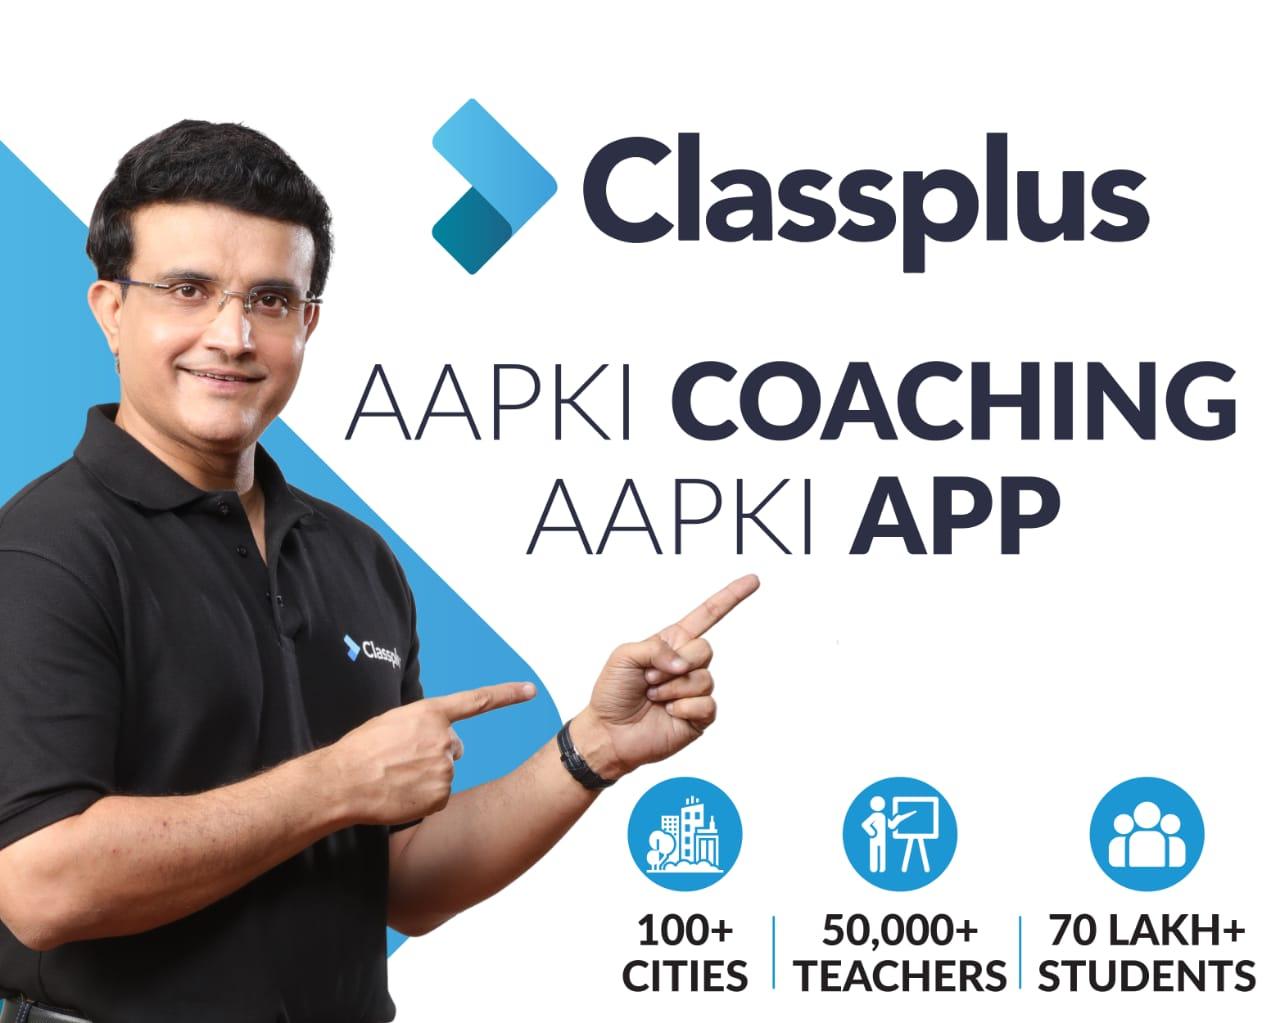 Classplus signs former Indian Cricket team captain, Sourav Ganguly, as its Brand Ambassador